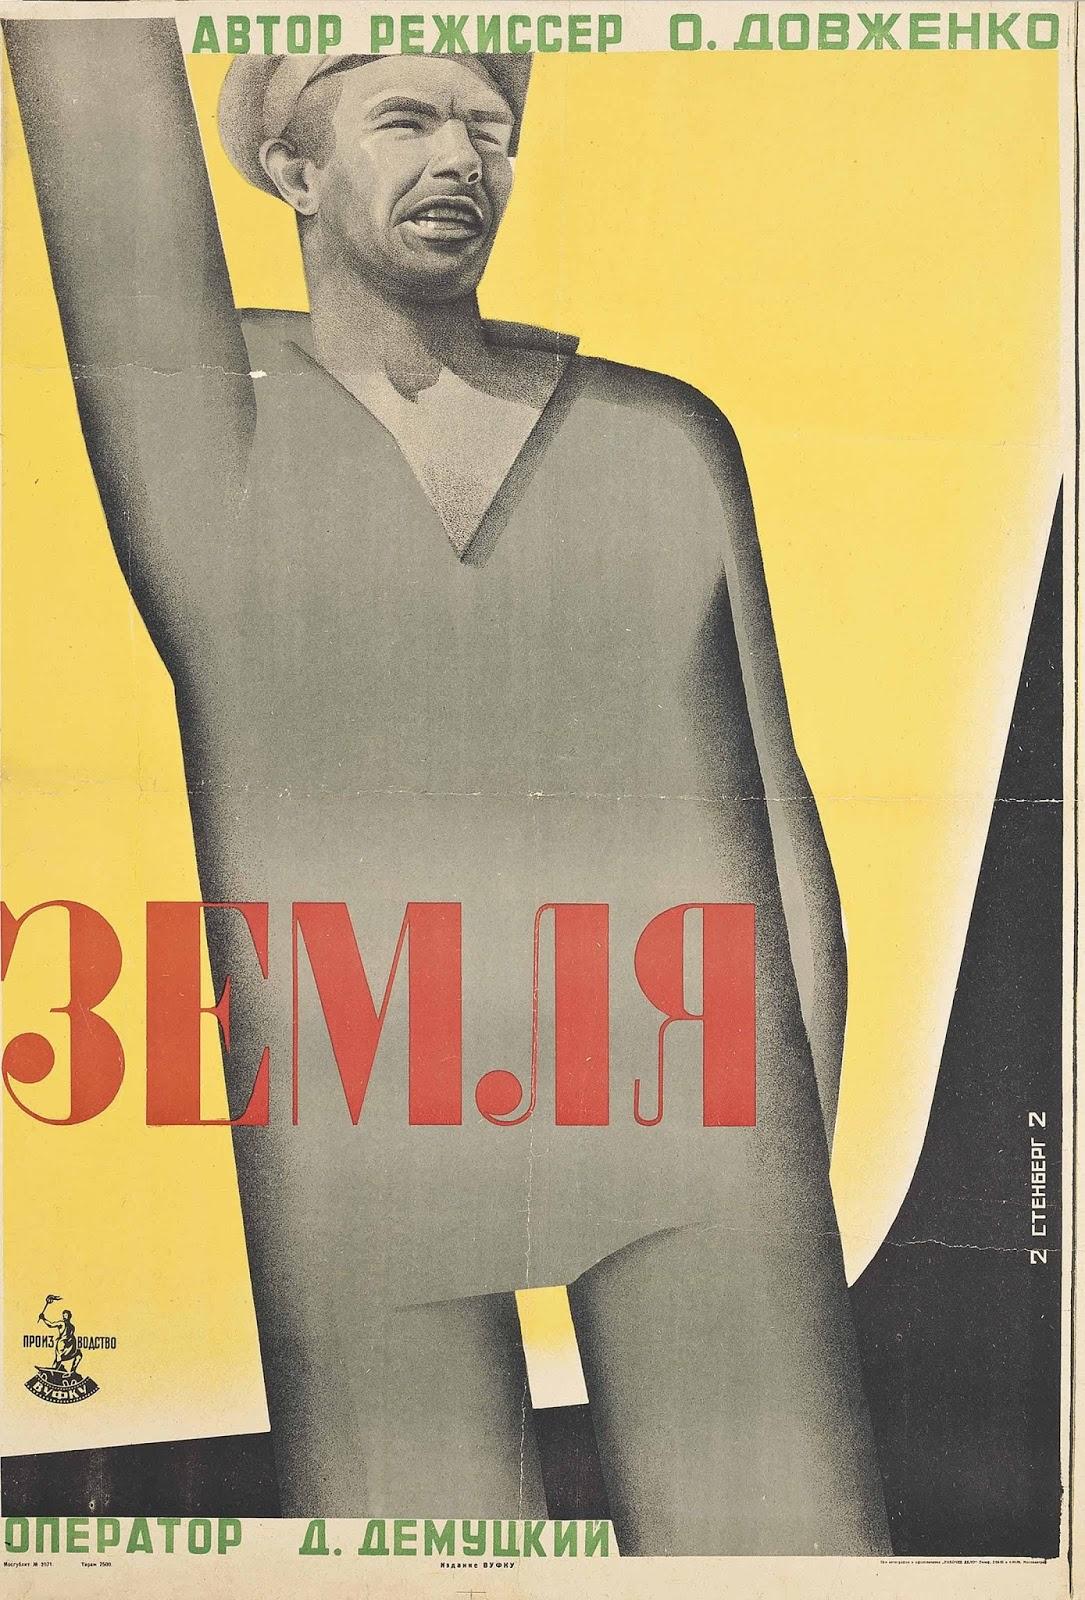 The best Soviet cinema commander - Ivan Dmitriev 23